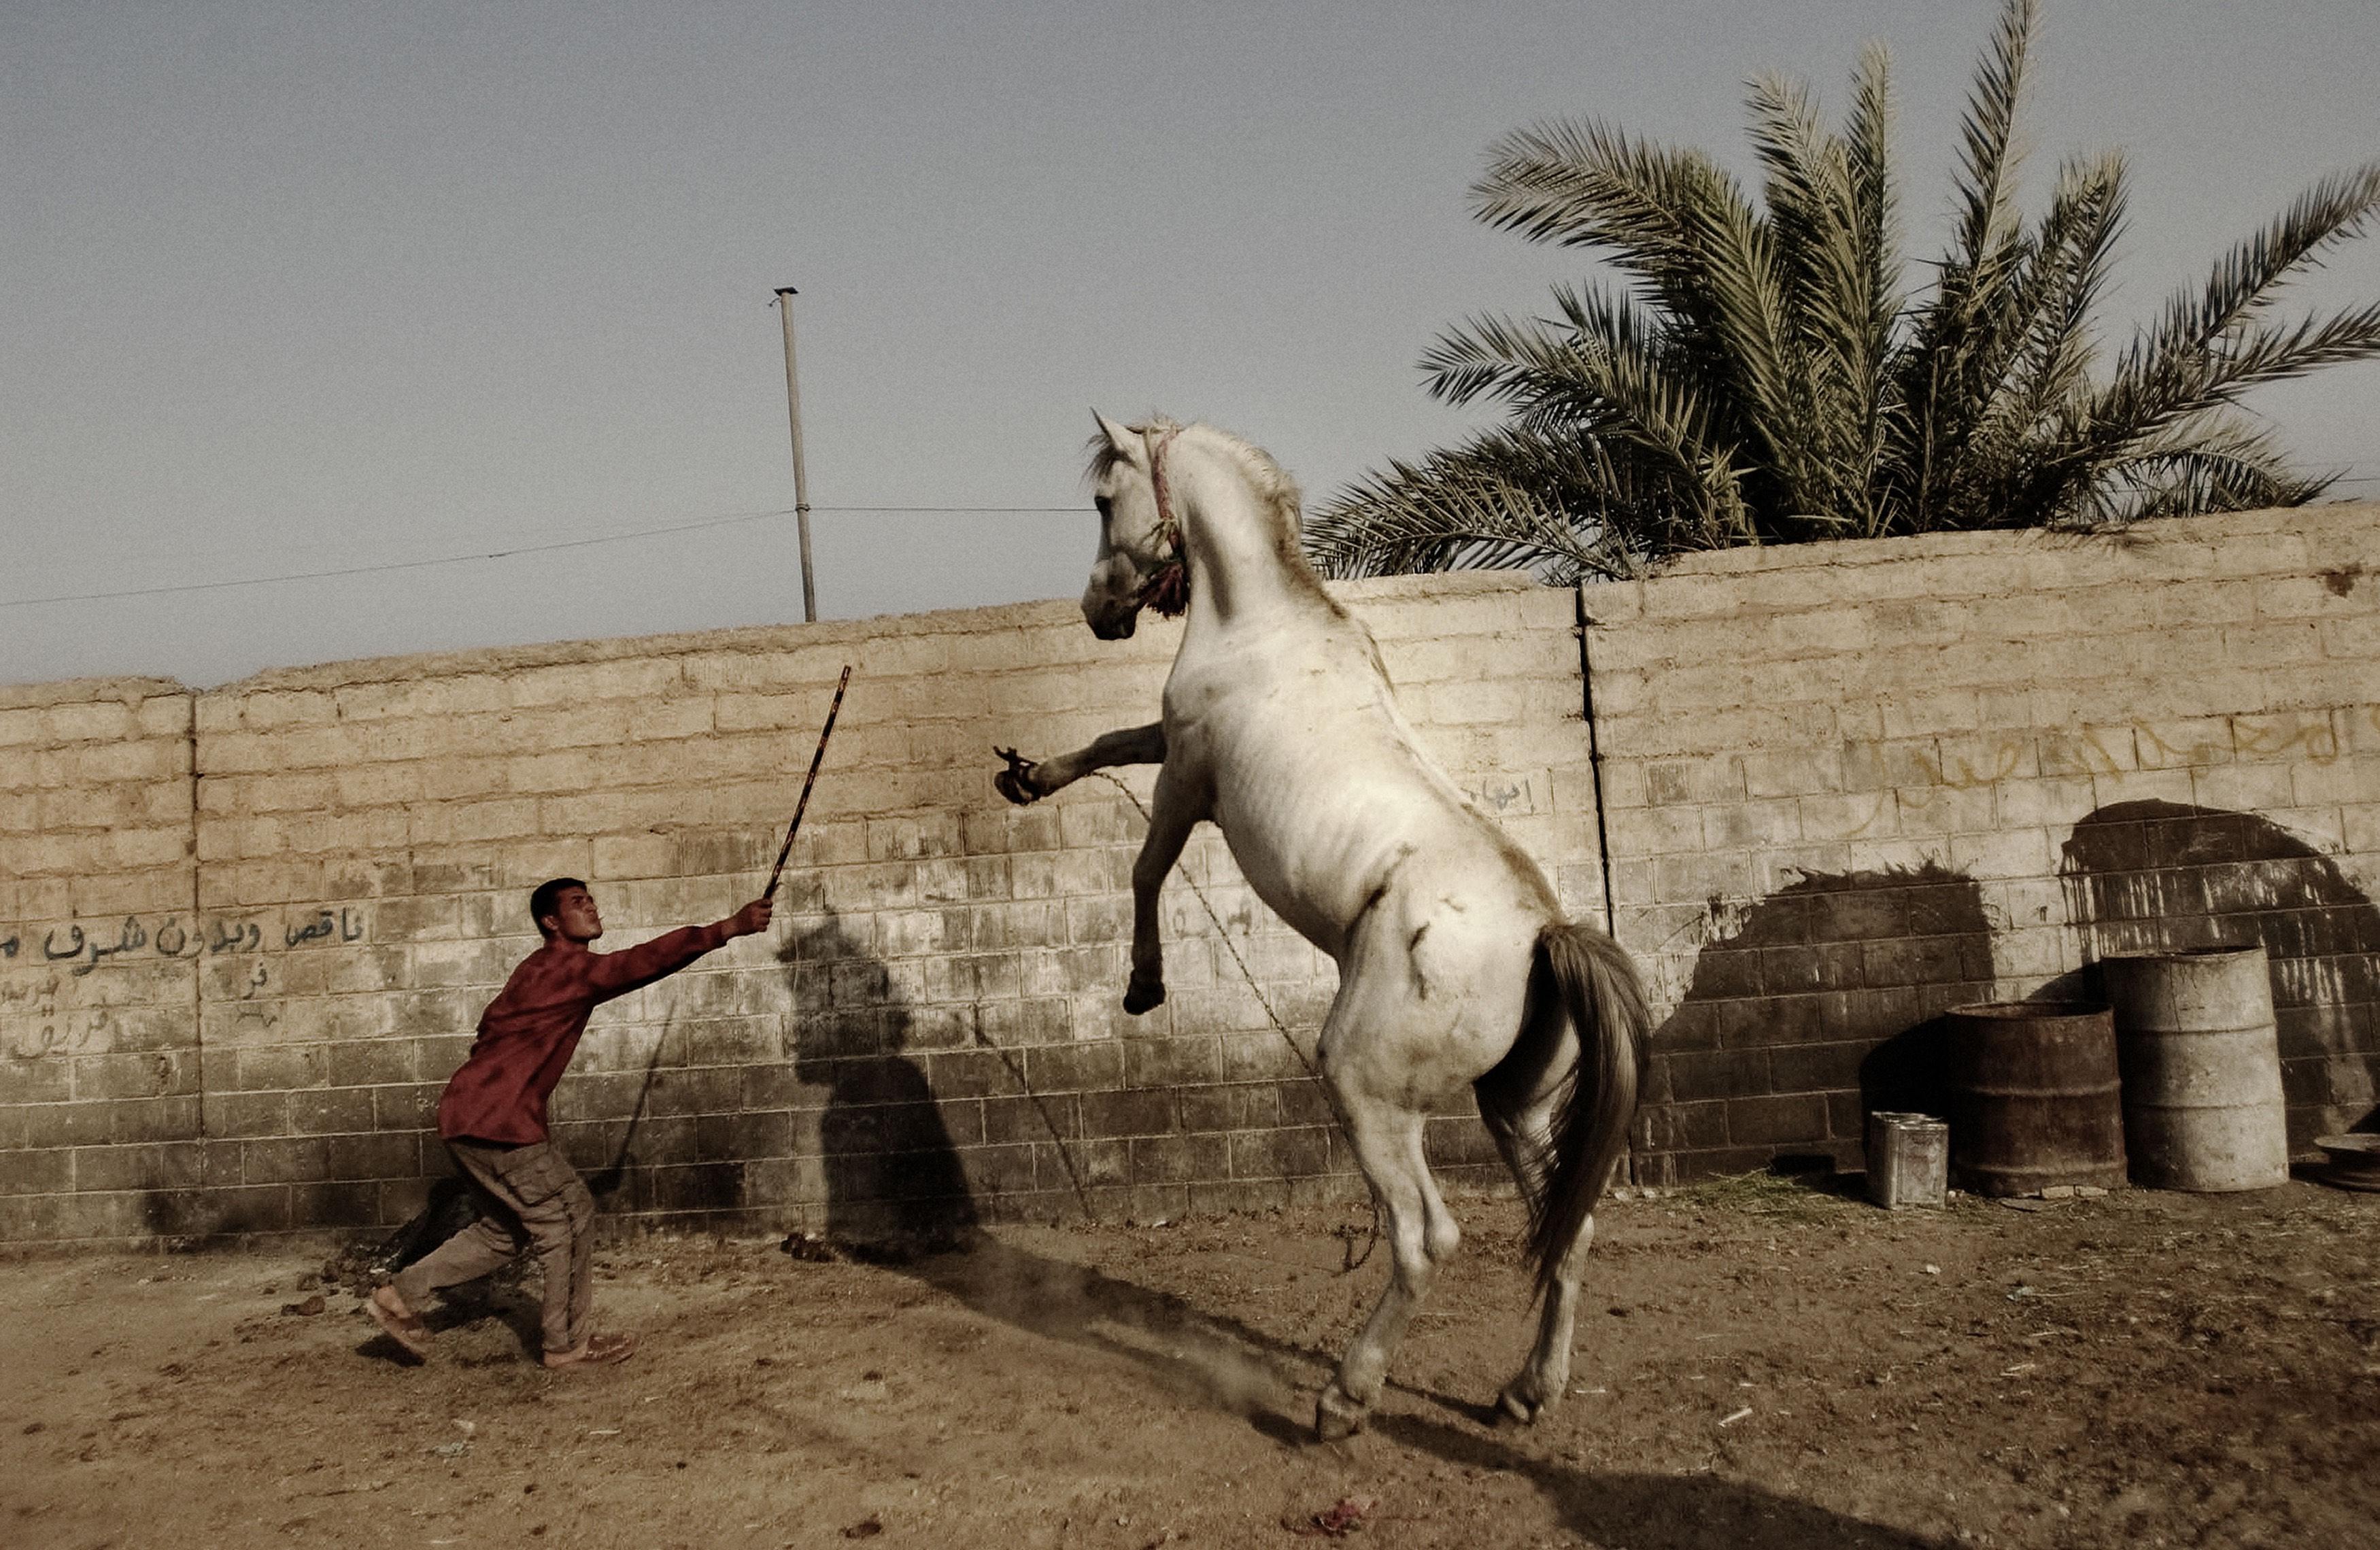 Baghdad, Iraq. July, 2004 © Moises Saman/ Magnum Photos